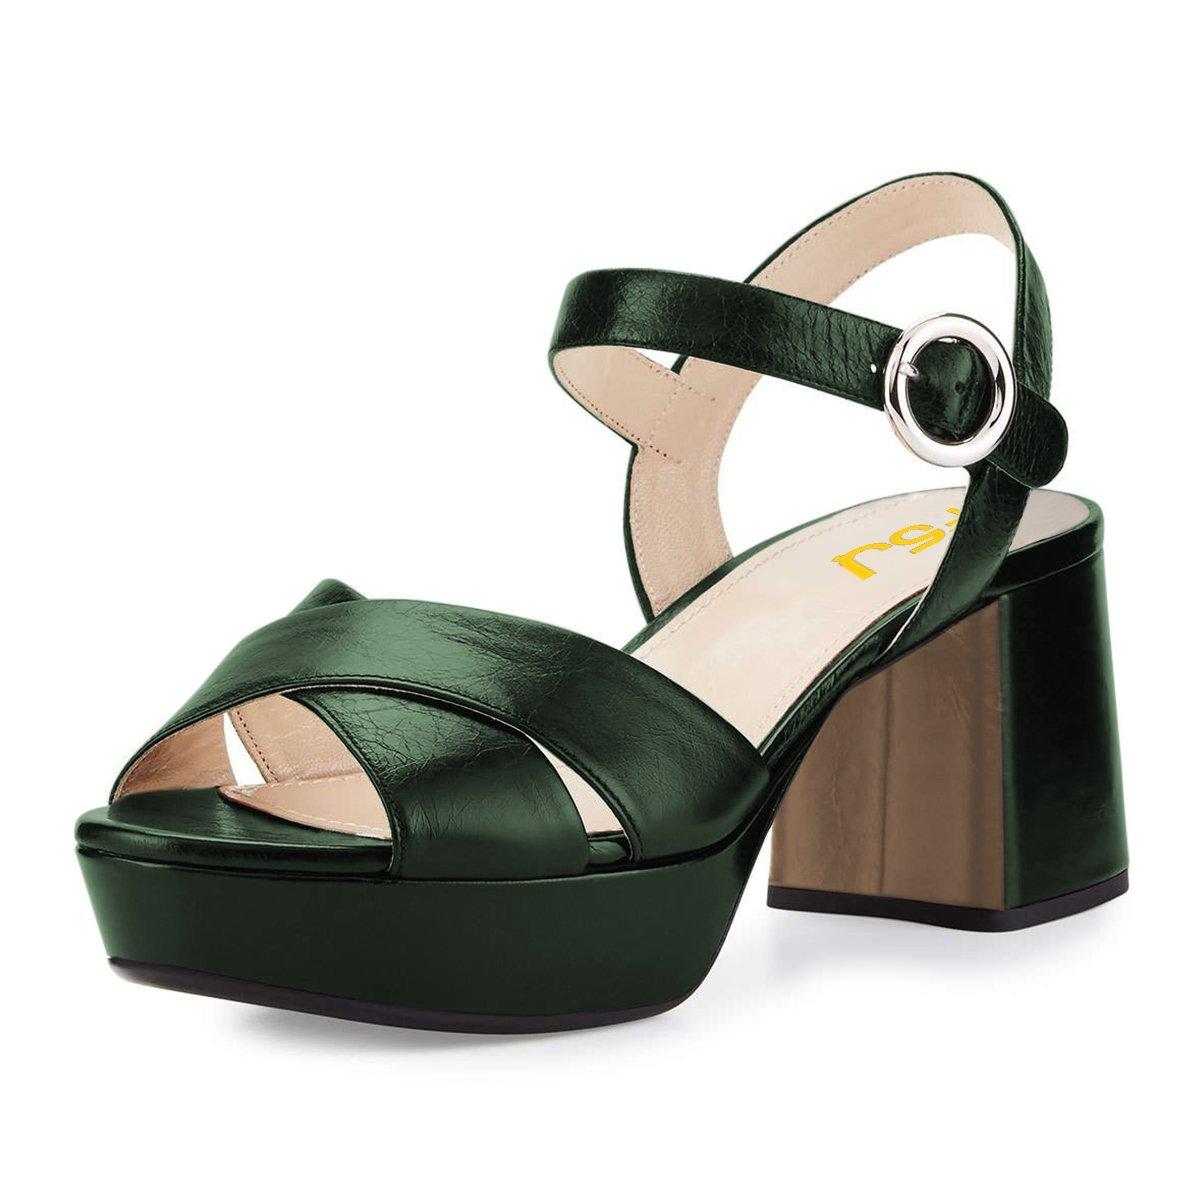 FSJ Women Summer Ankle Strap Chunky Heel Sandals Peep Toe Platform Comfortable Shoes Size 4-15 US B078QTGZJQ 15 B(M) US|Green